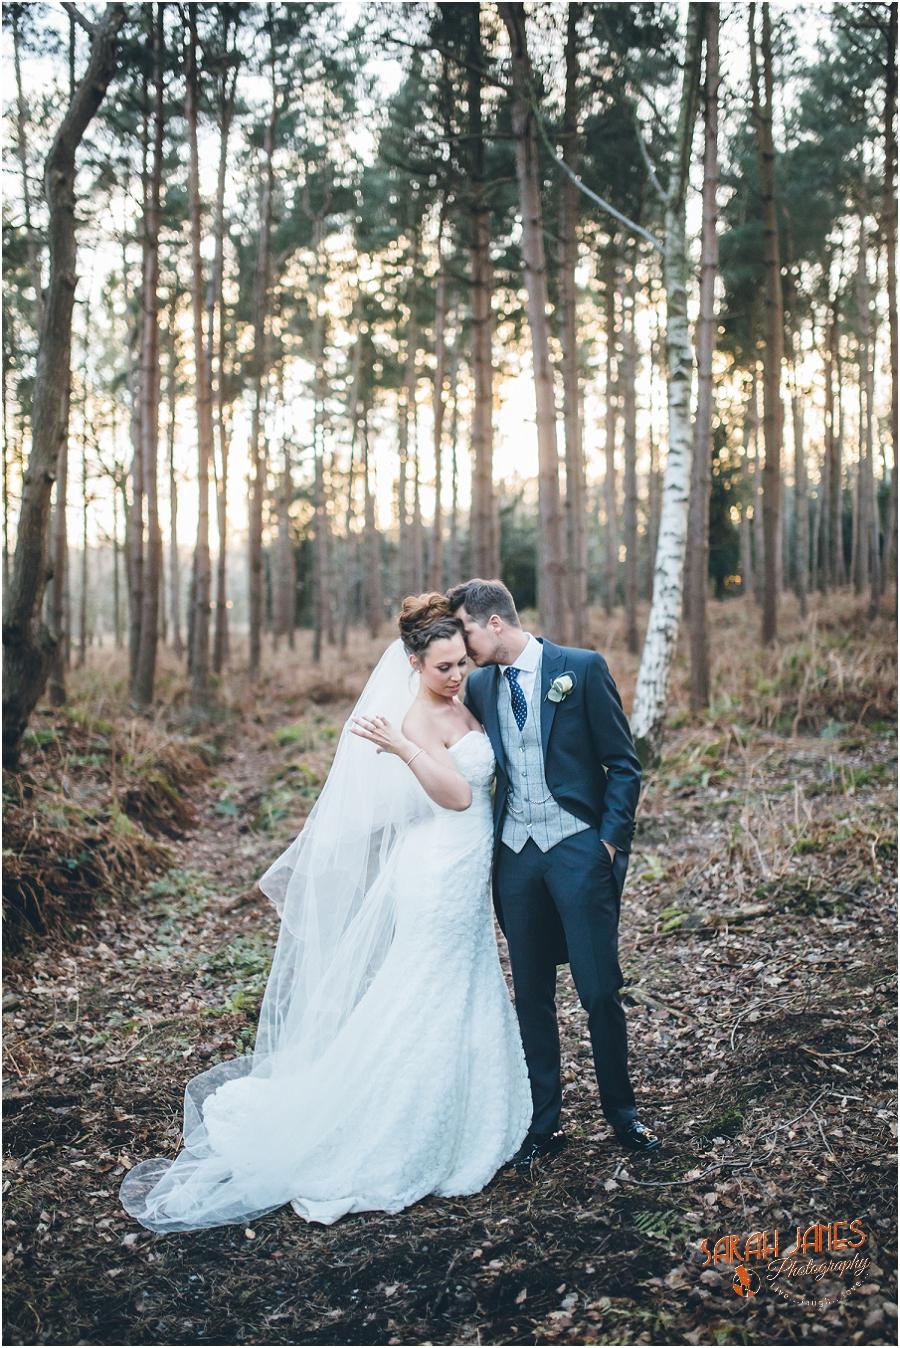 Sarah Janes Photography, Wedding photography Chester, Wedding photographer Chester, Wedding photography at Peckforton Castle_0041.jpg